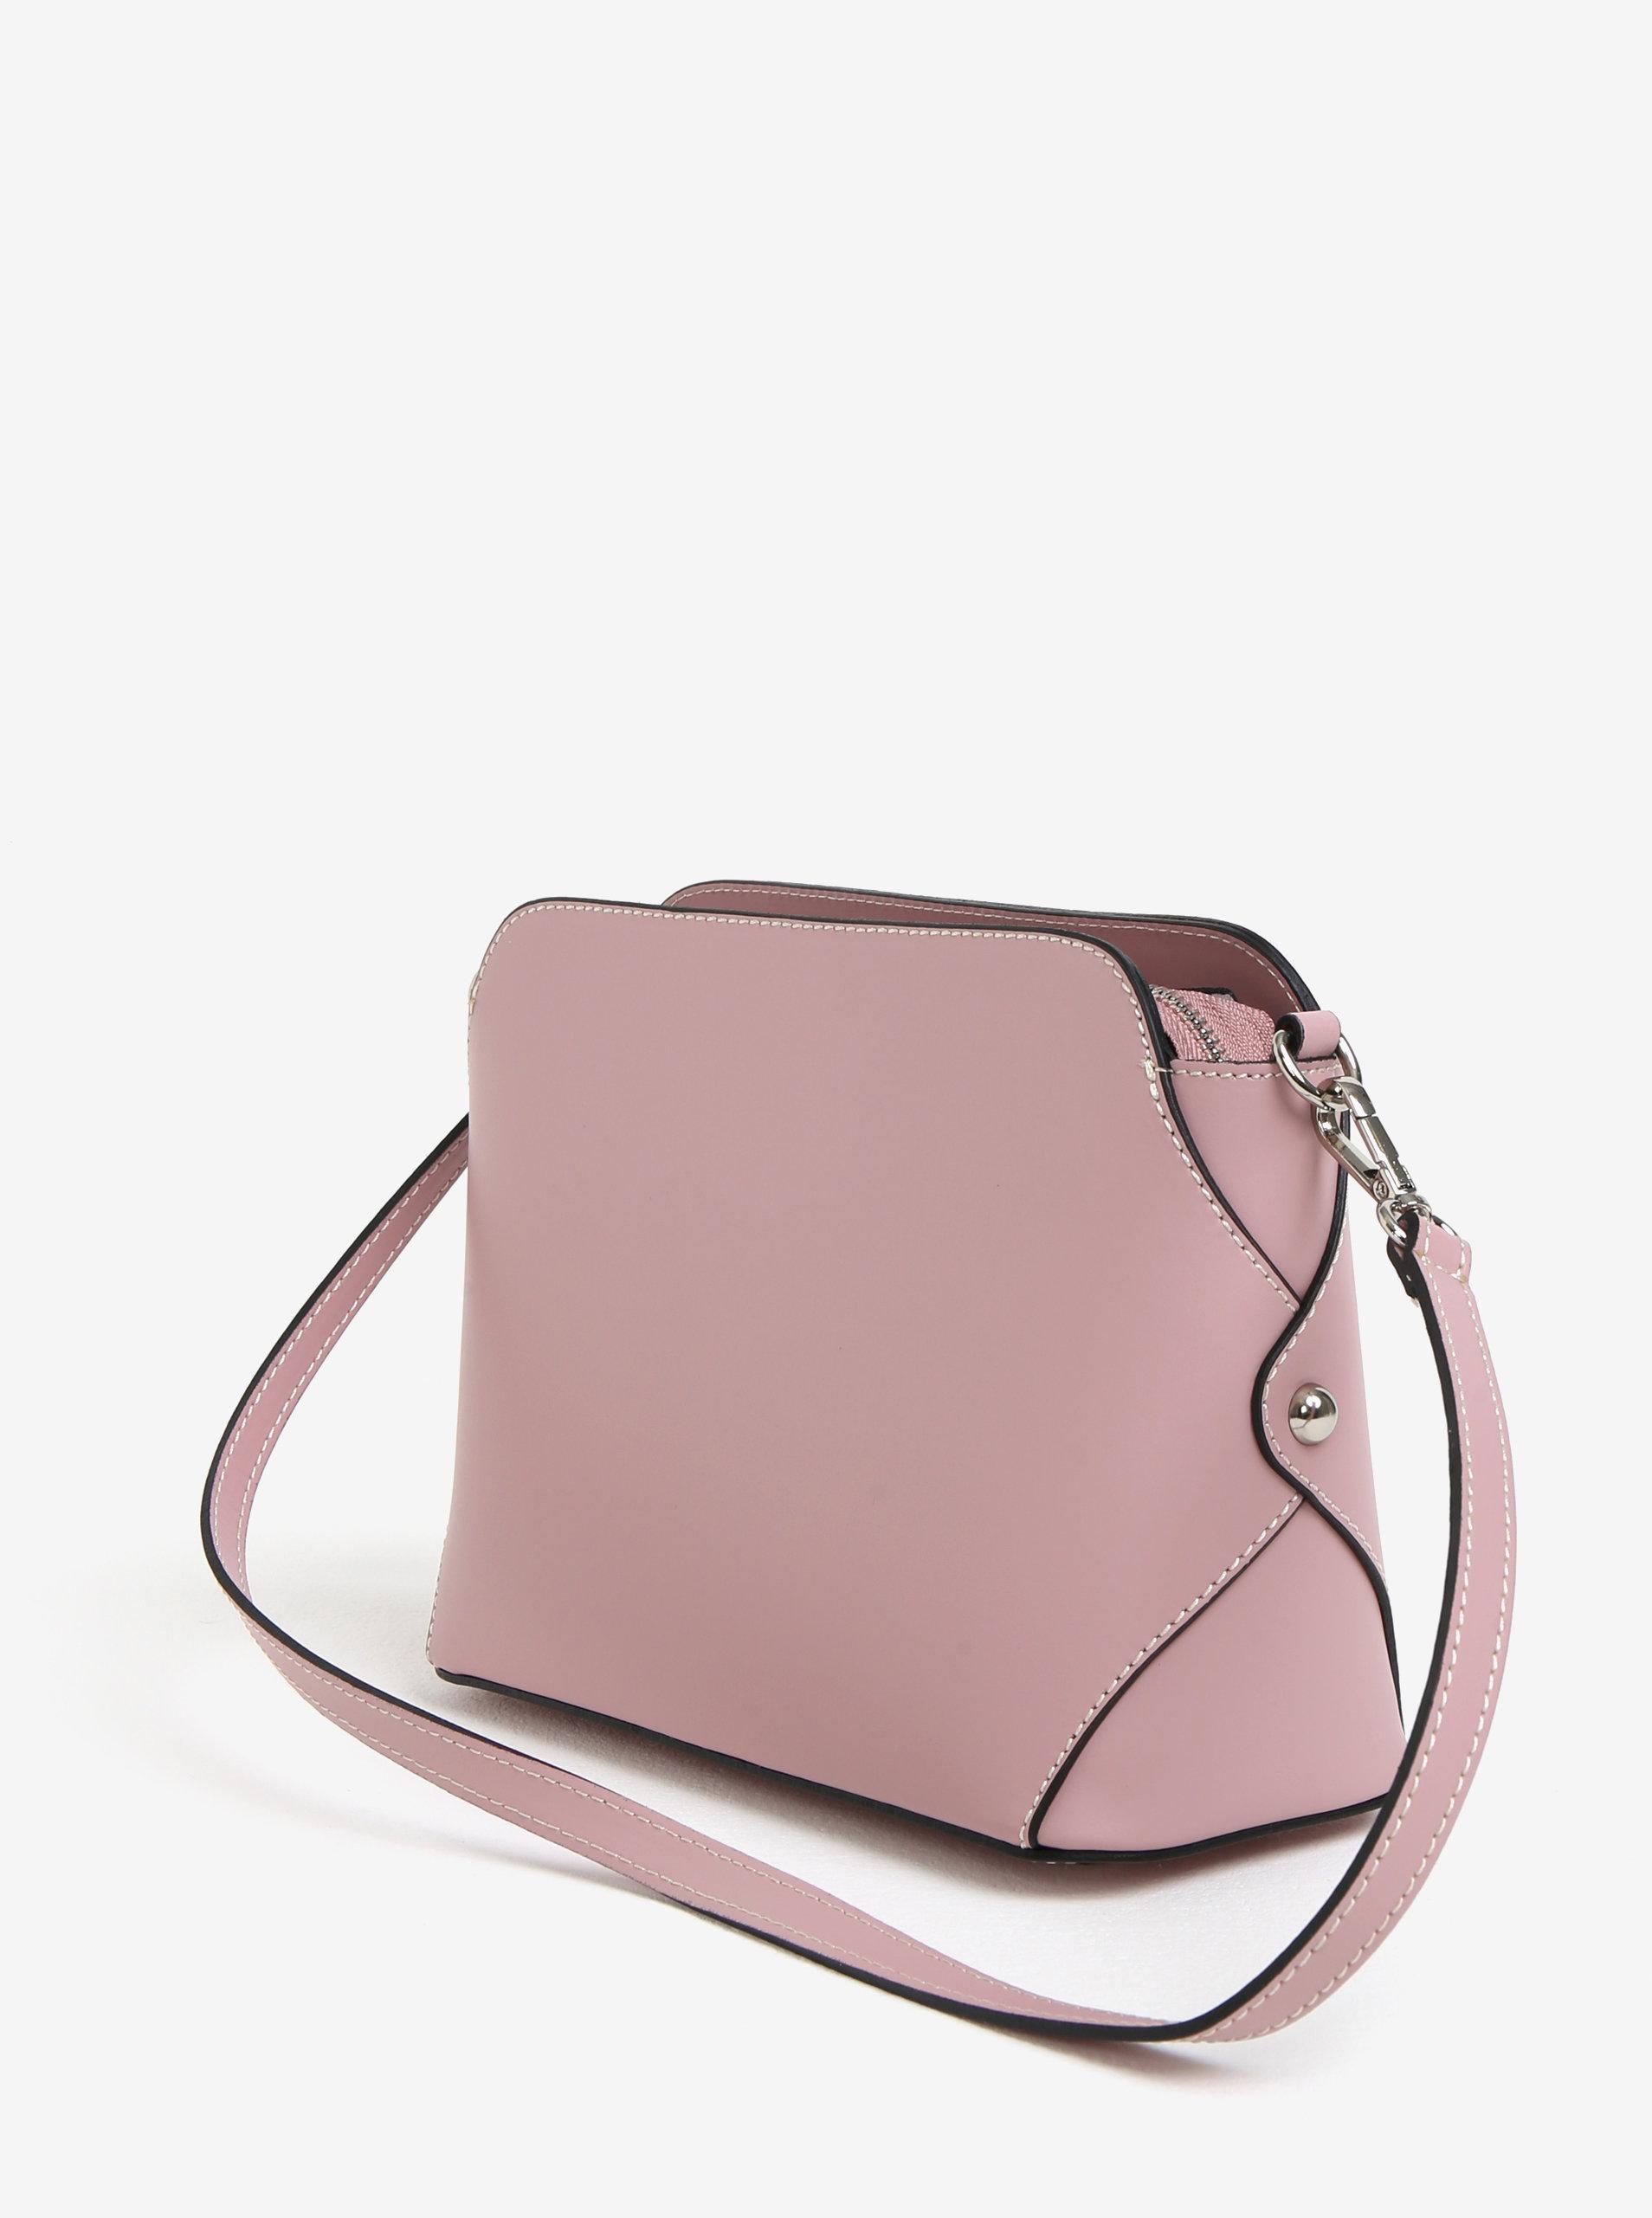 5782921f06 Růžová dámská kožená crossbody kabelka KARA ...